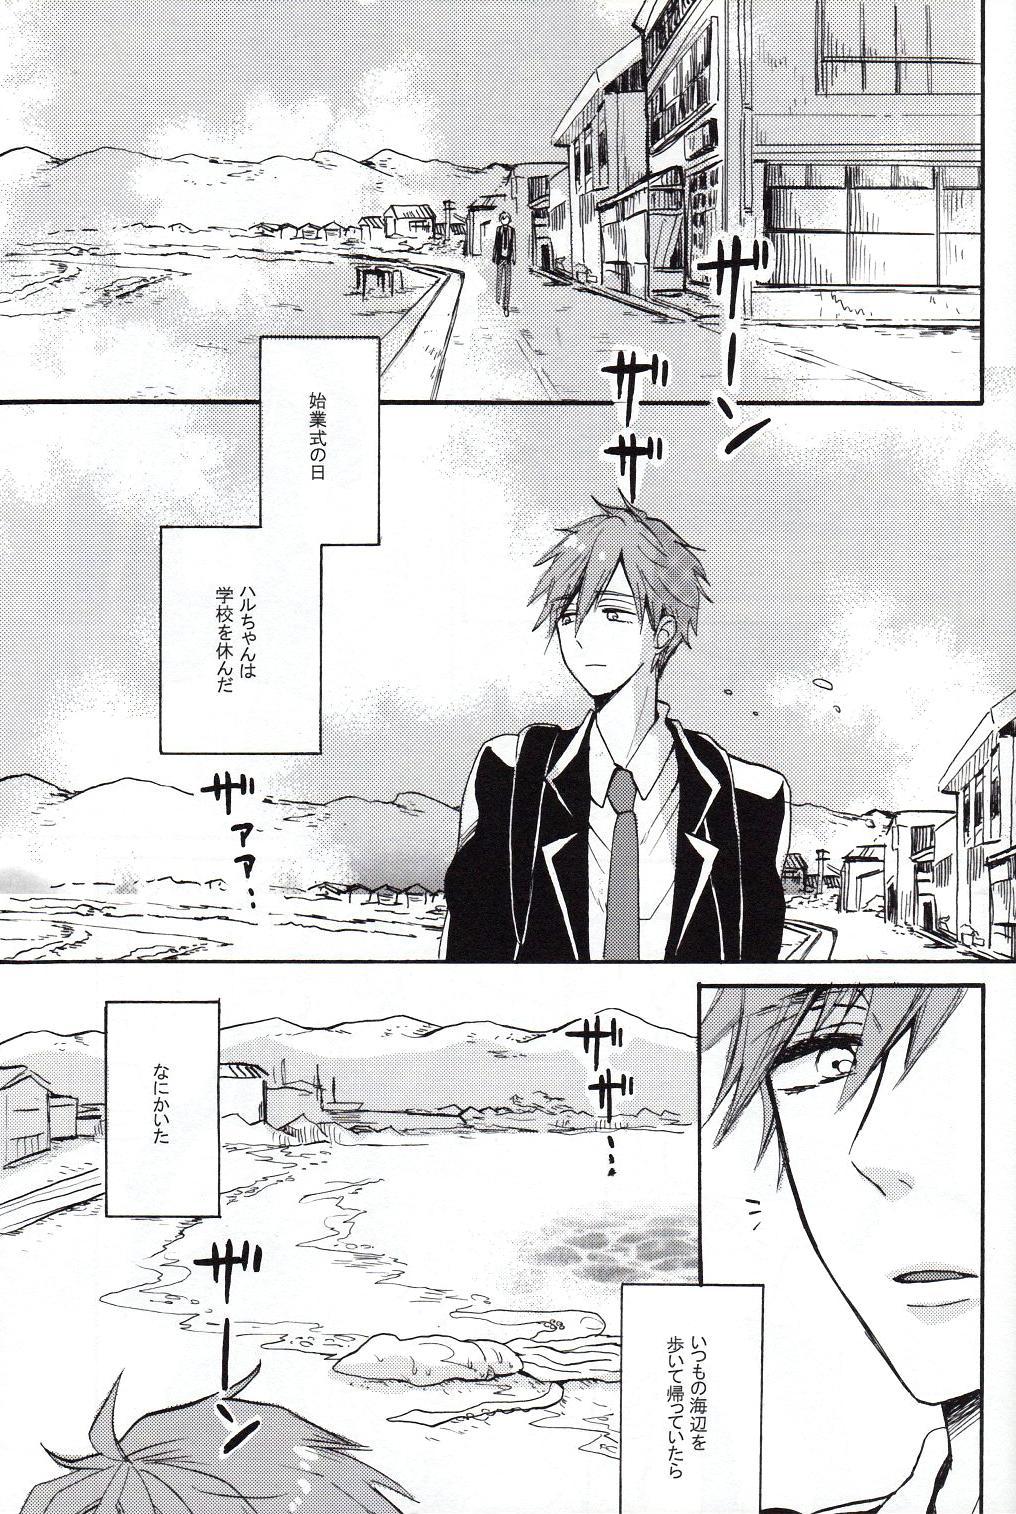 [hn (pirori)] Mako-chan jana-Ika!? (Free!) 1